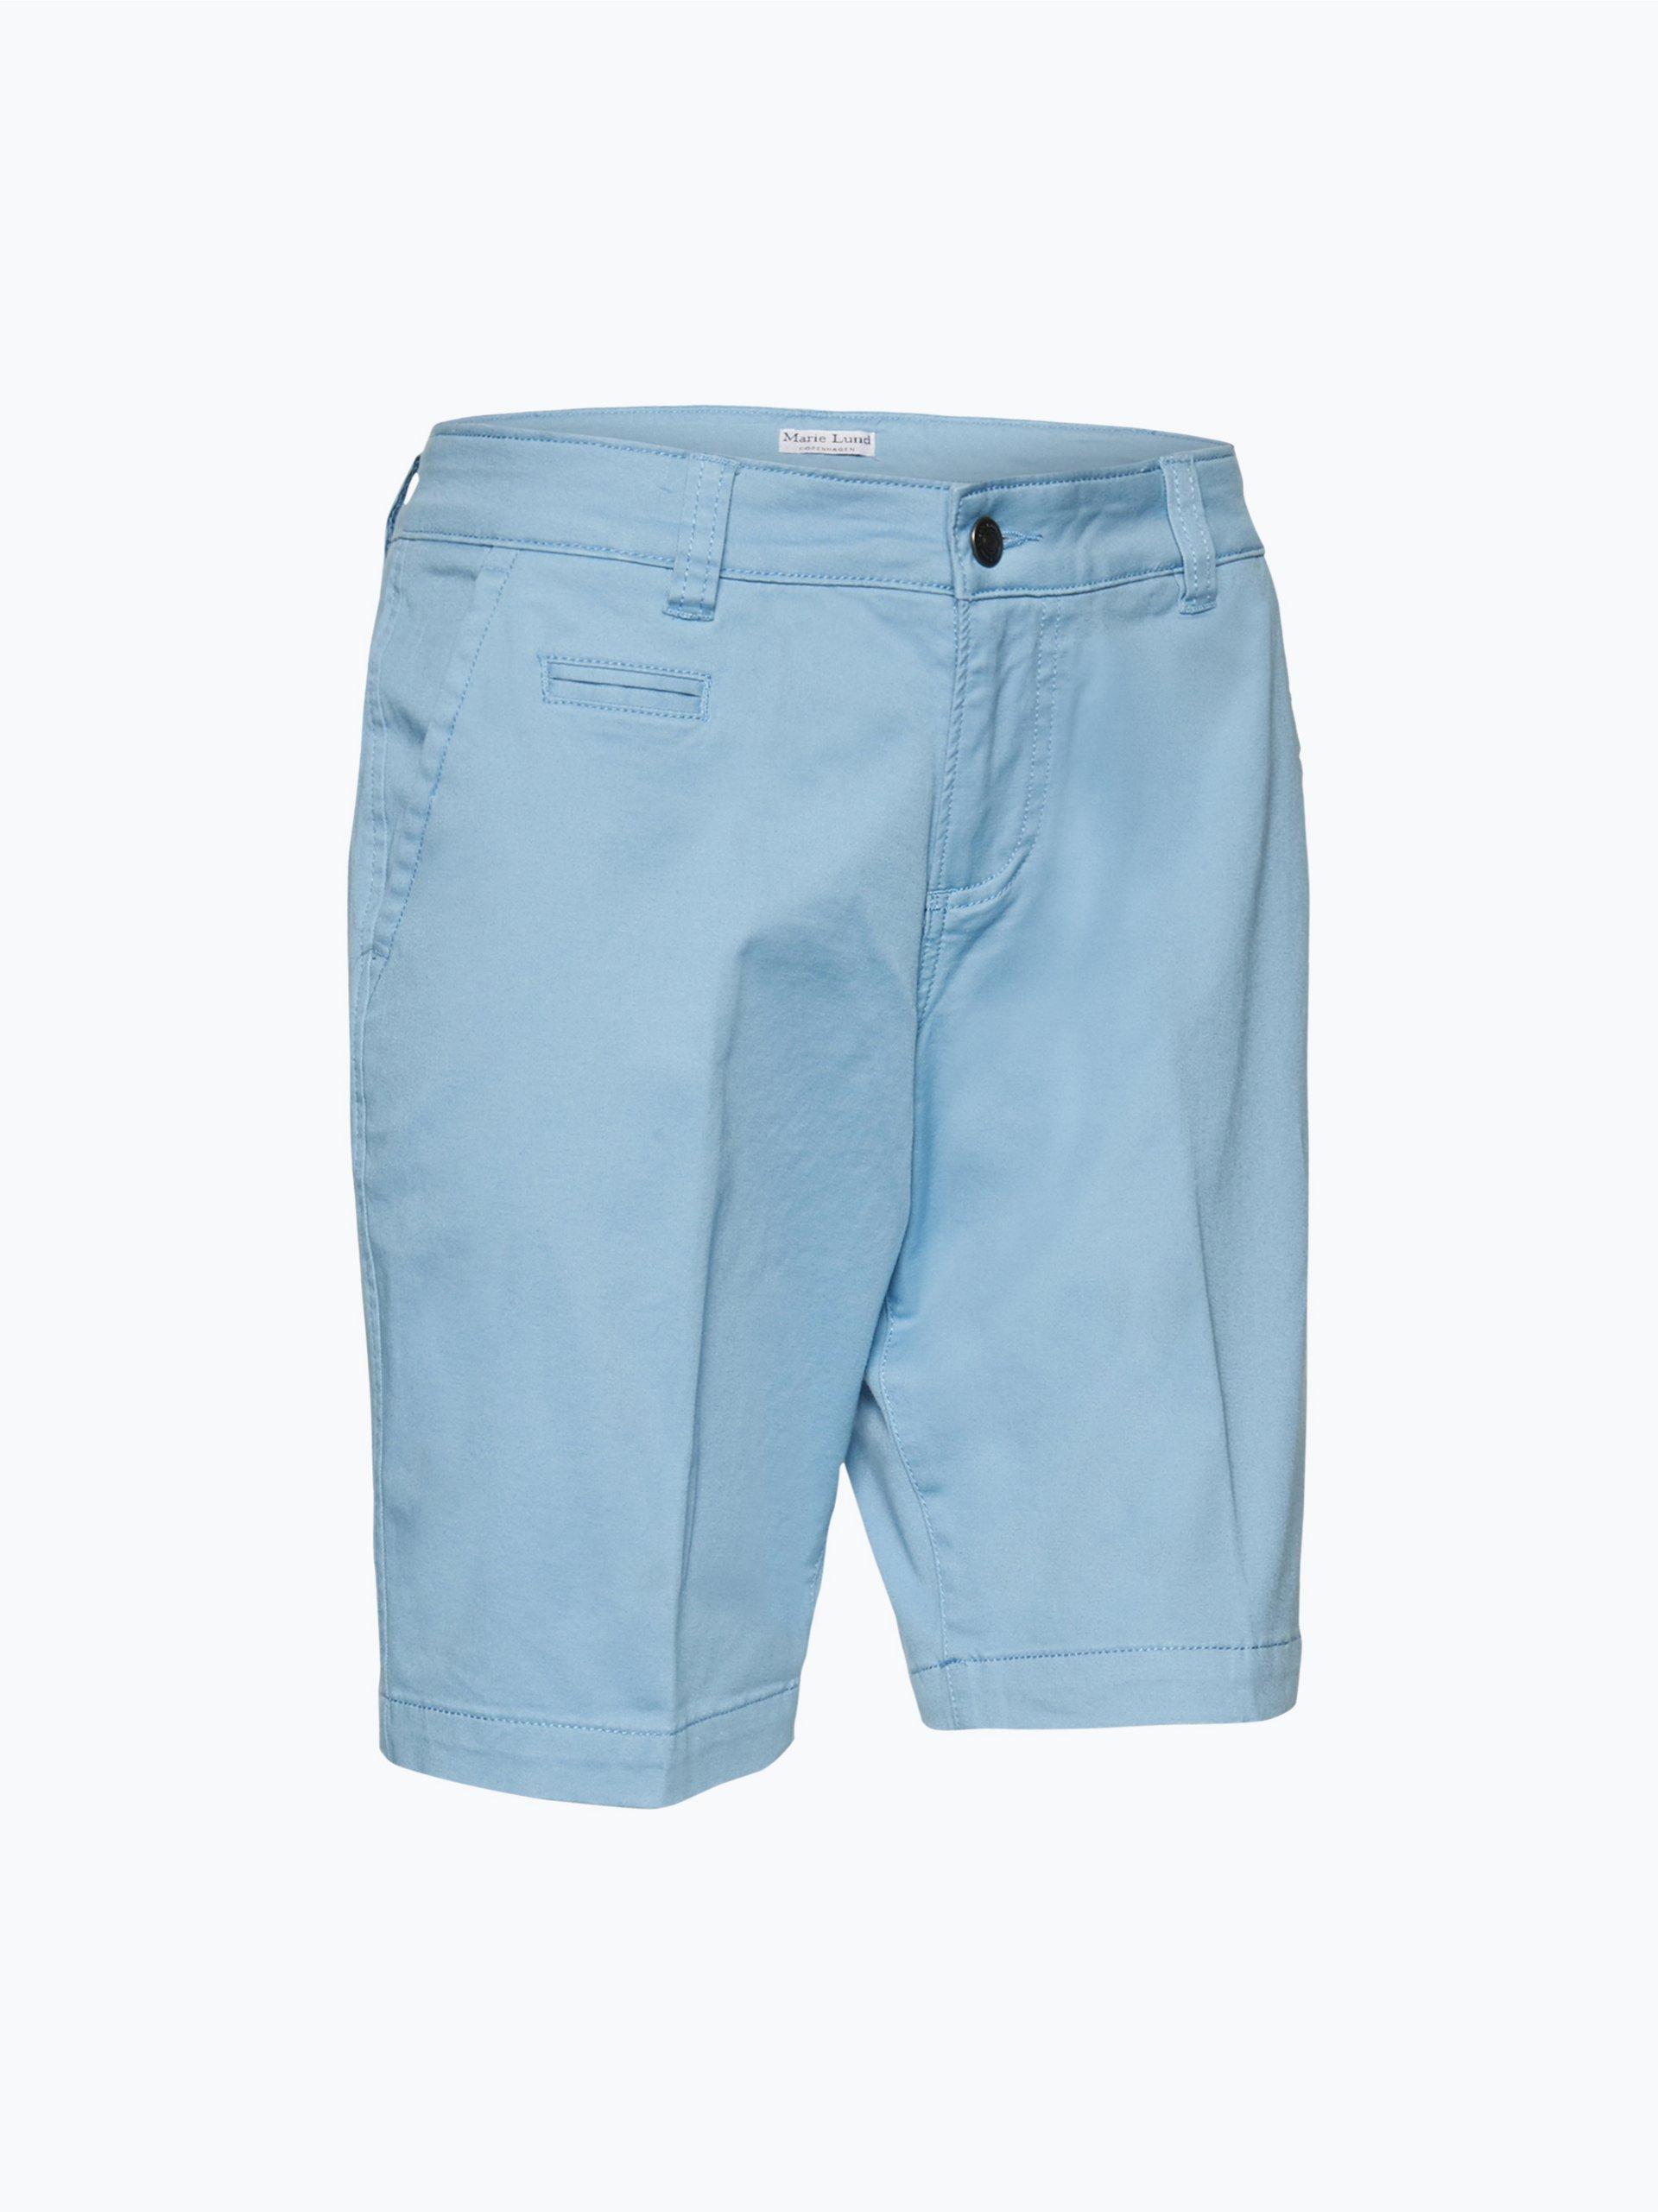 marie lund damen shorts blau uni online kaufen vangraaf com. Black Bedroom Furniture Sets. Home Design Ideas